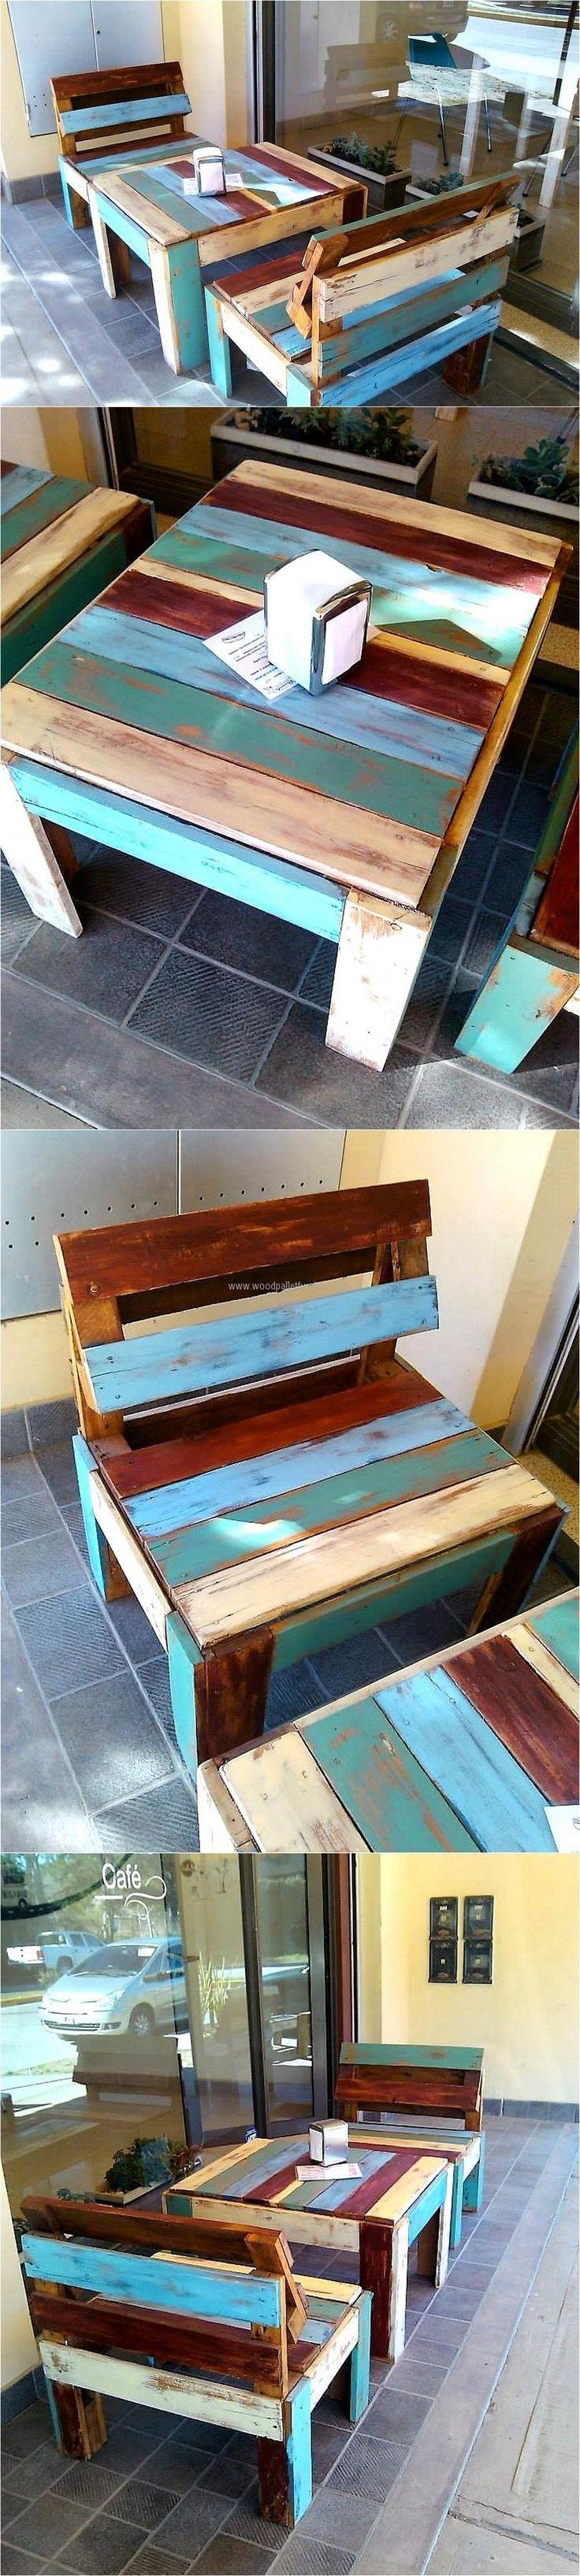 repurposed-wooden-pallet-furniture